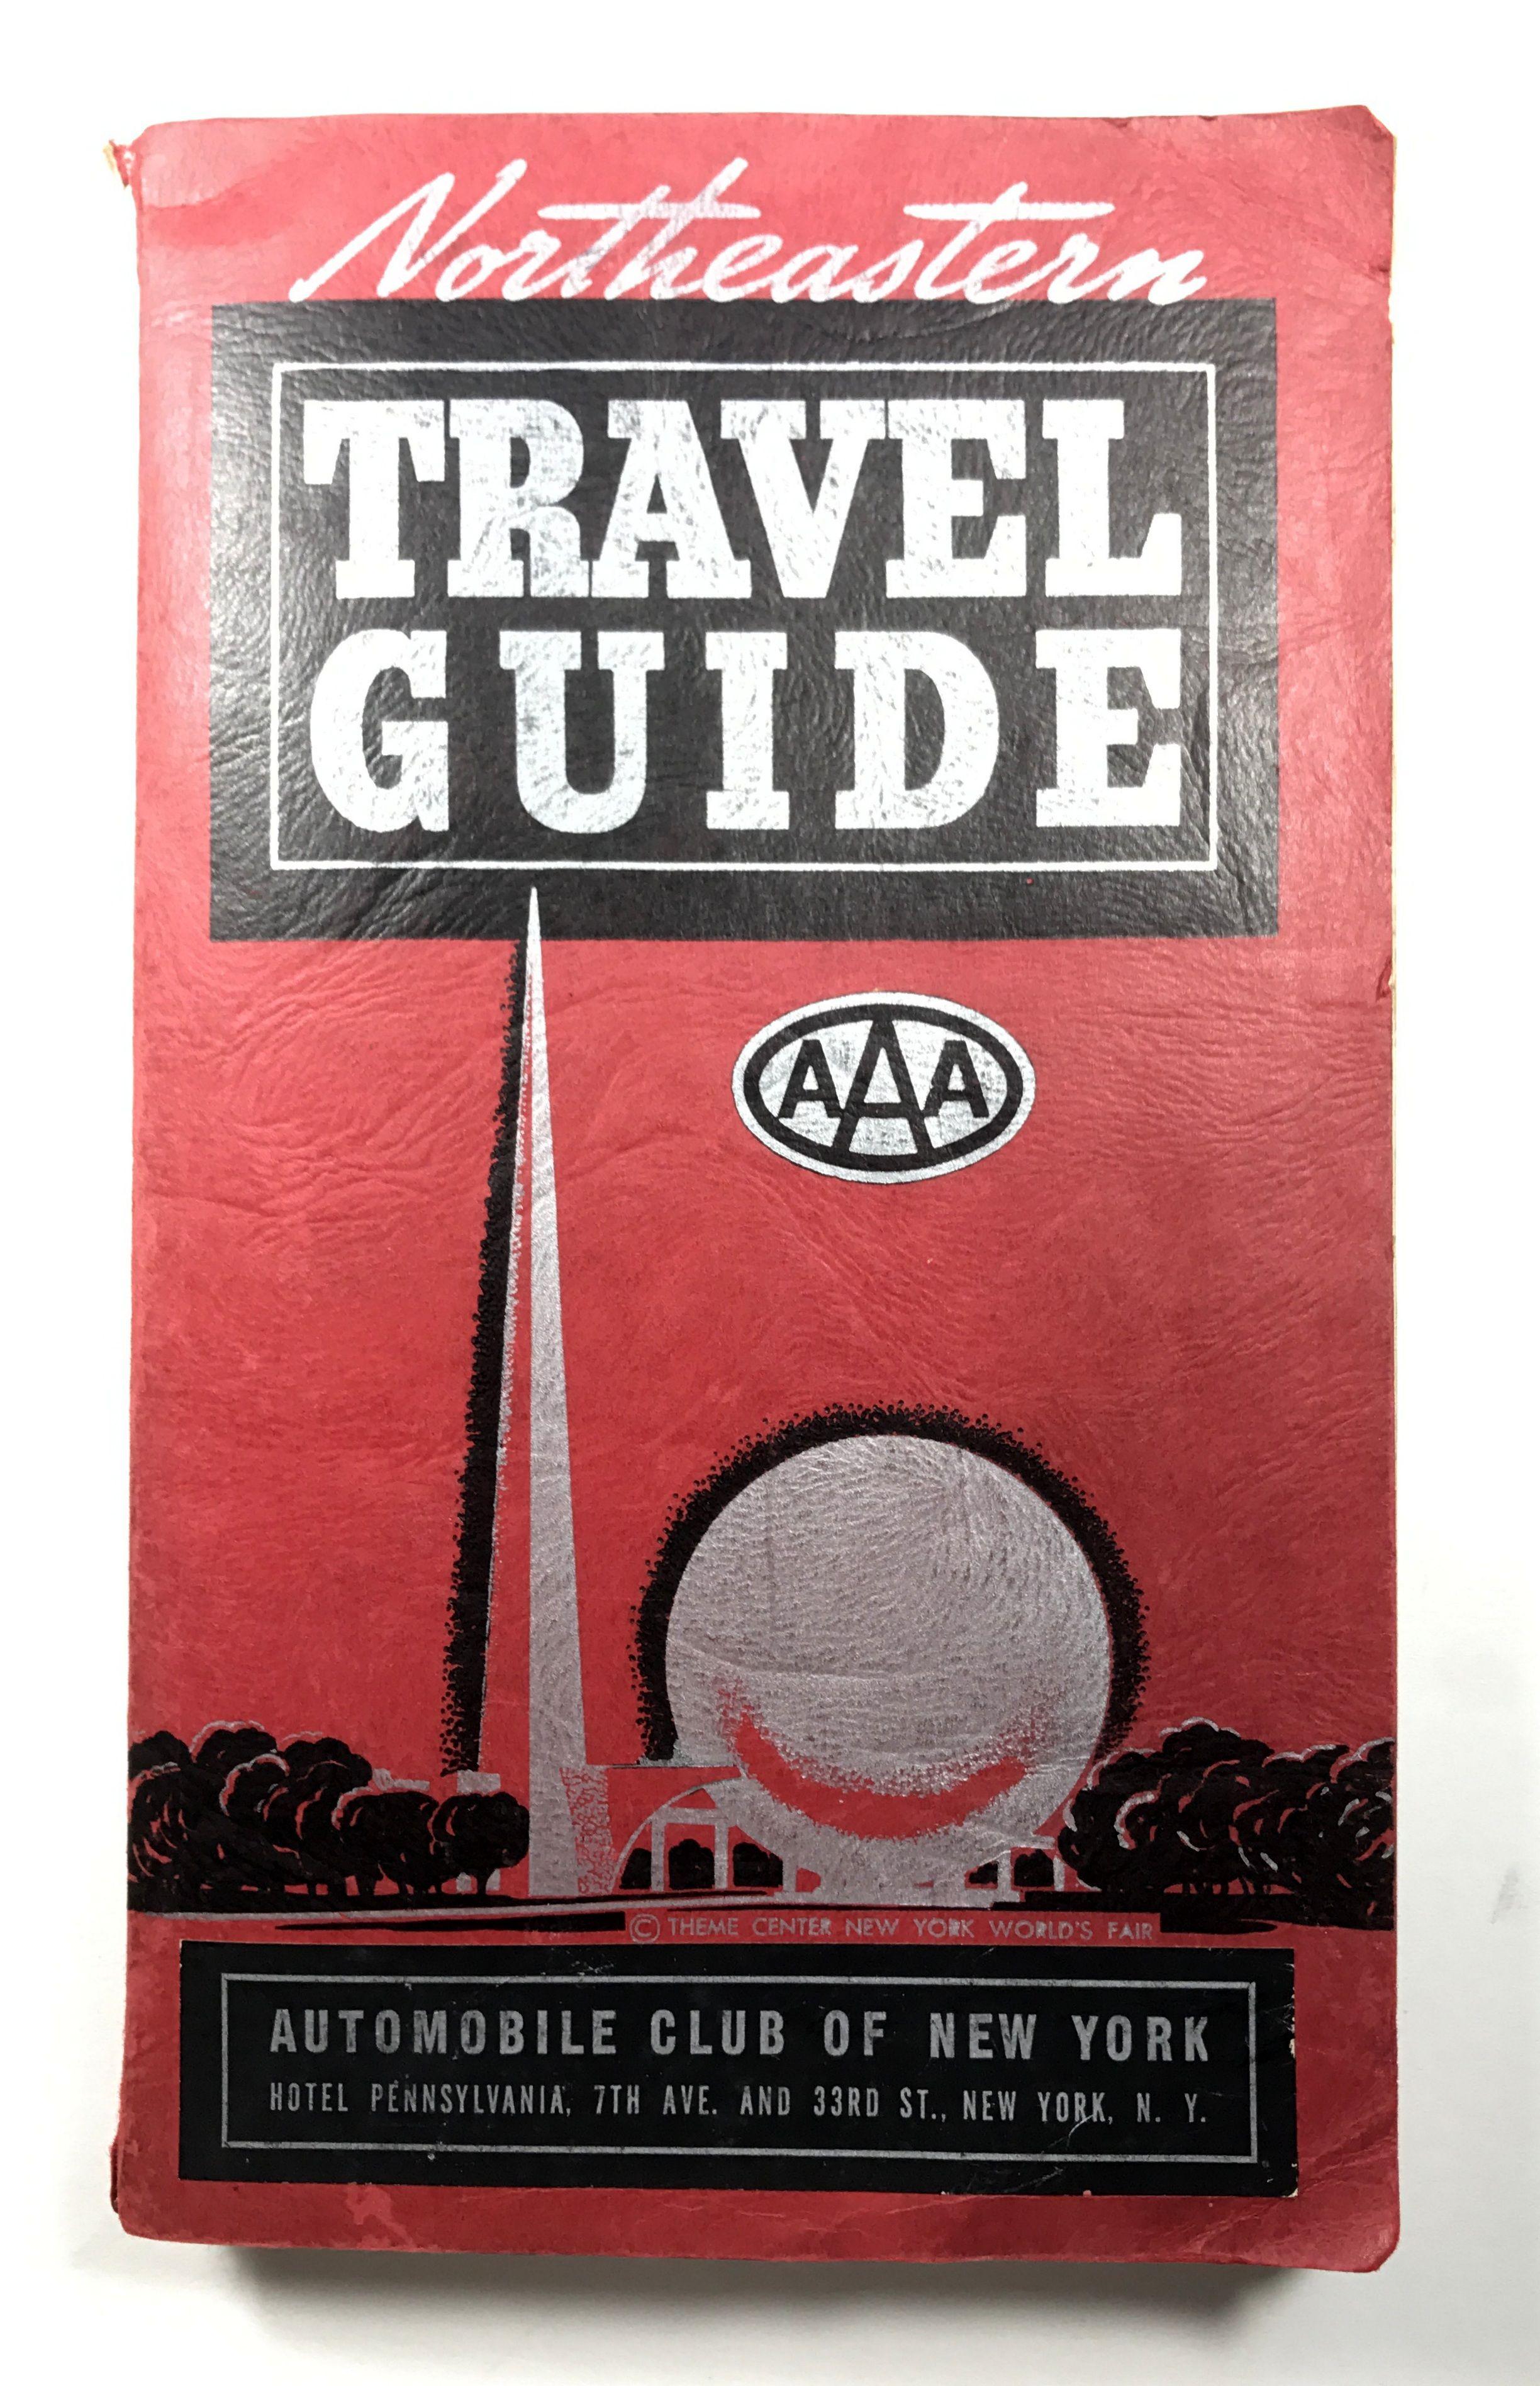 1939 new york world's fair aaa travel guide